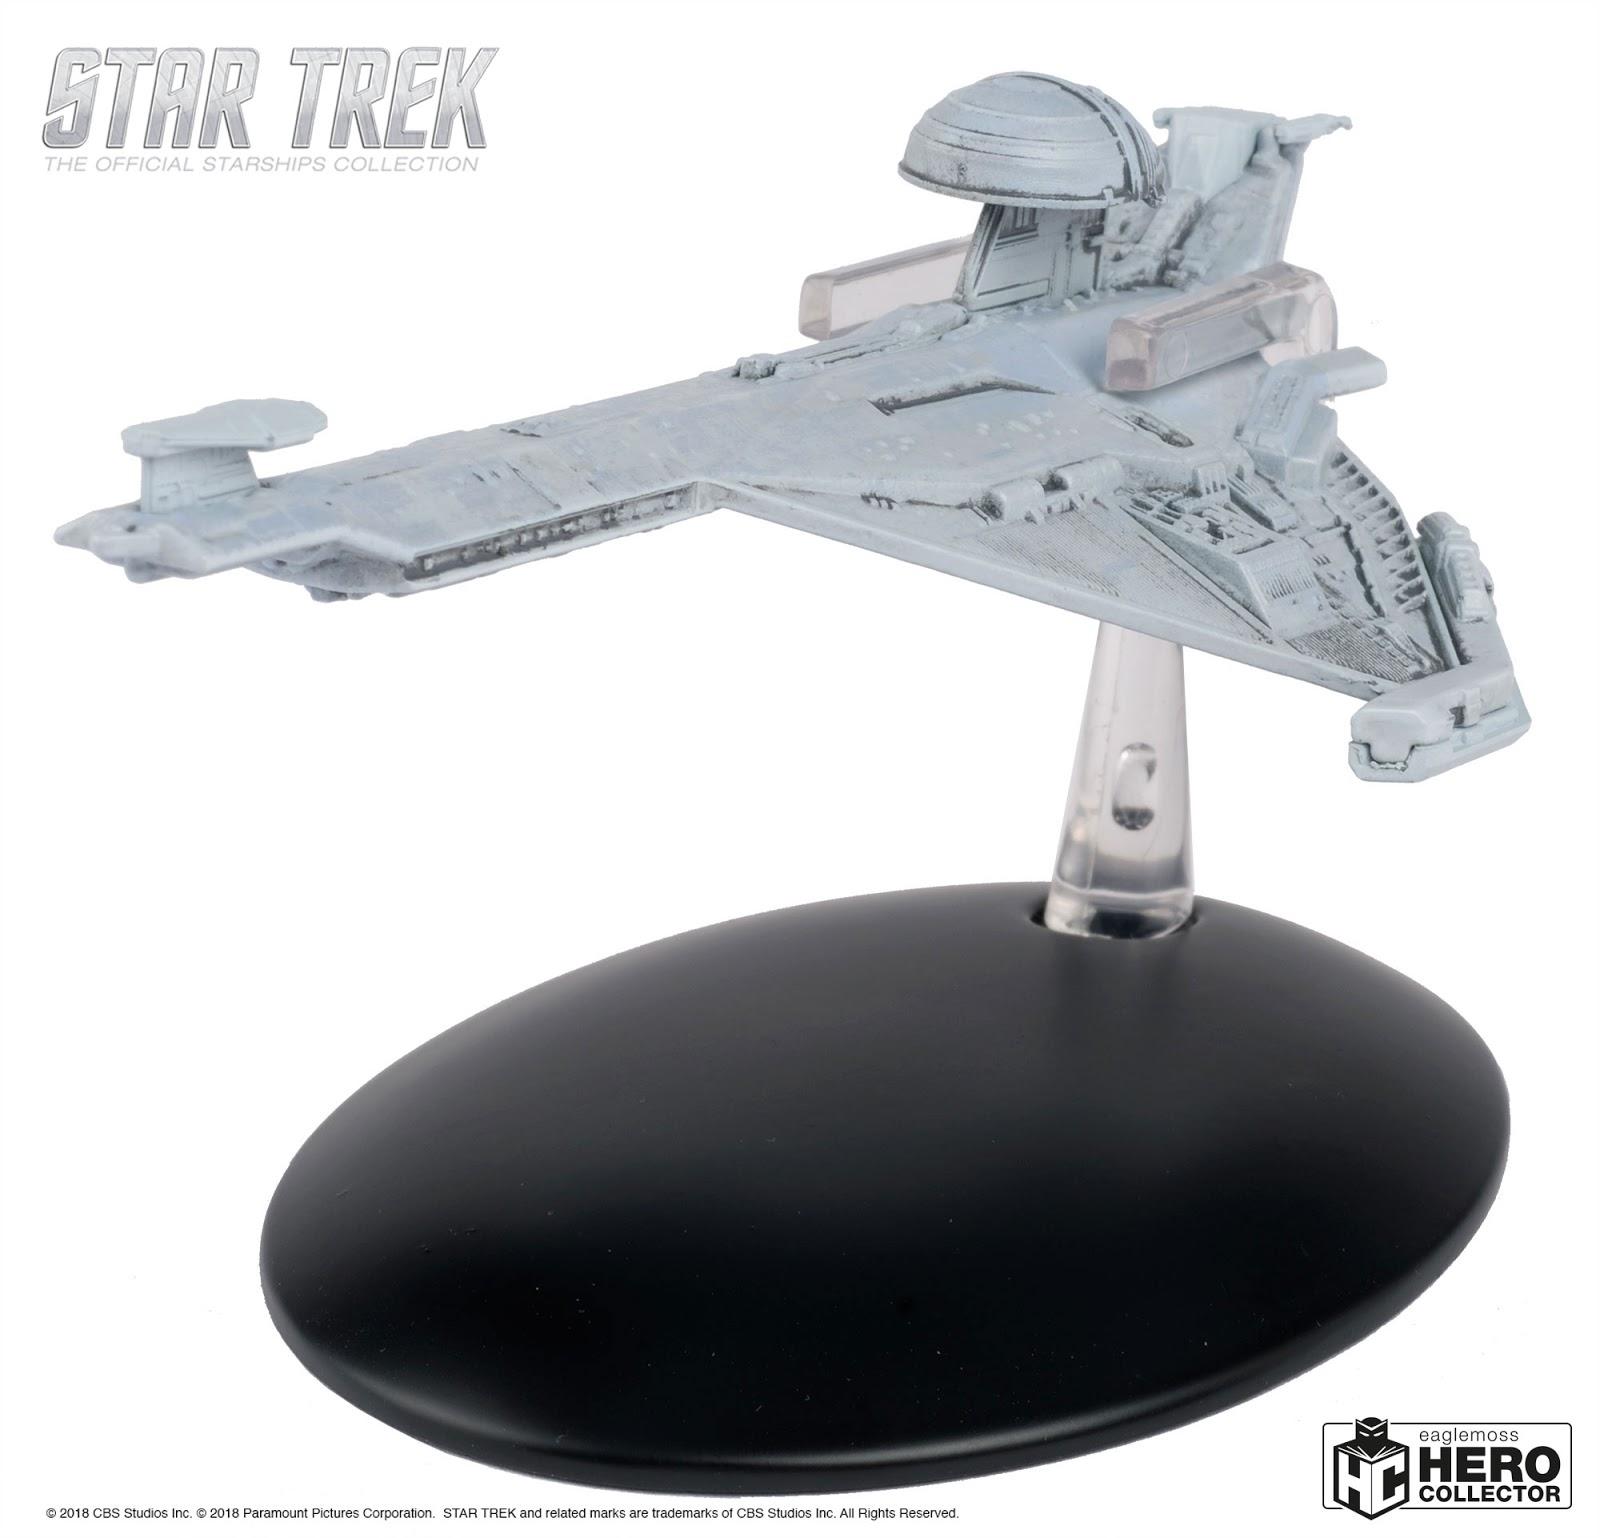 Vulcan T/'Pau Apollo-class starship Star Trek Eaglemoss w//Magazine Iusse 141